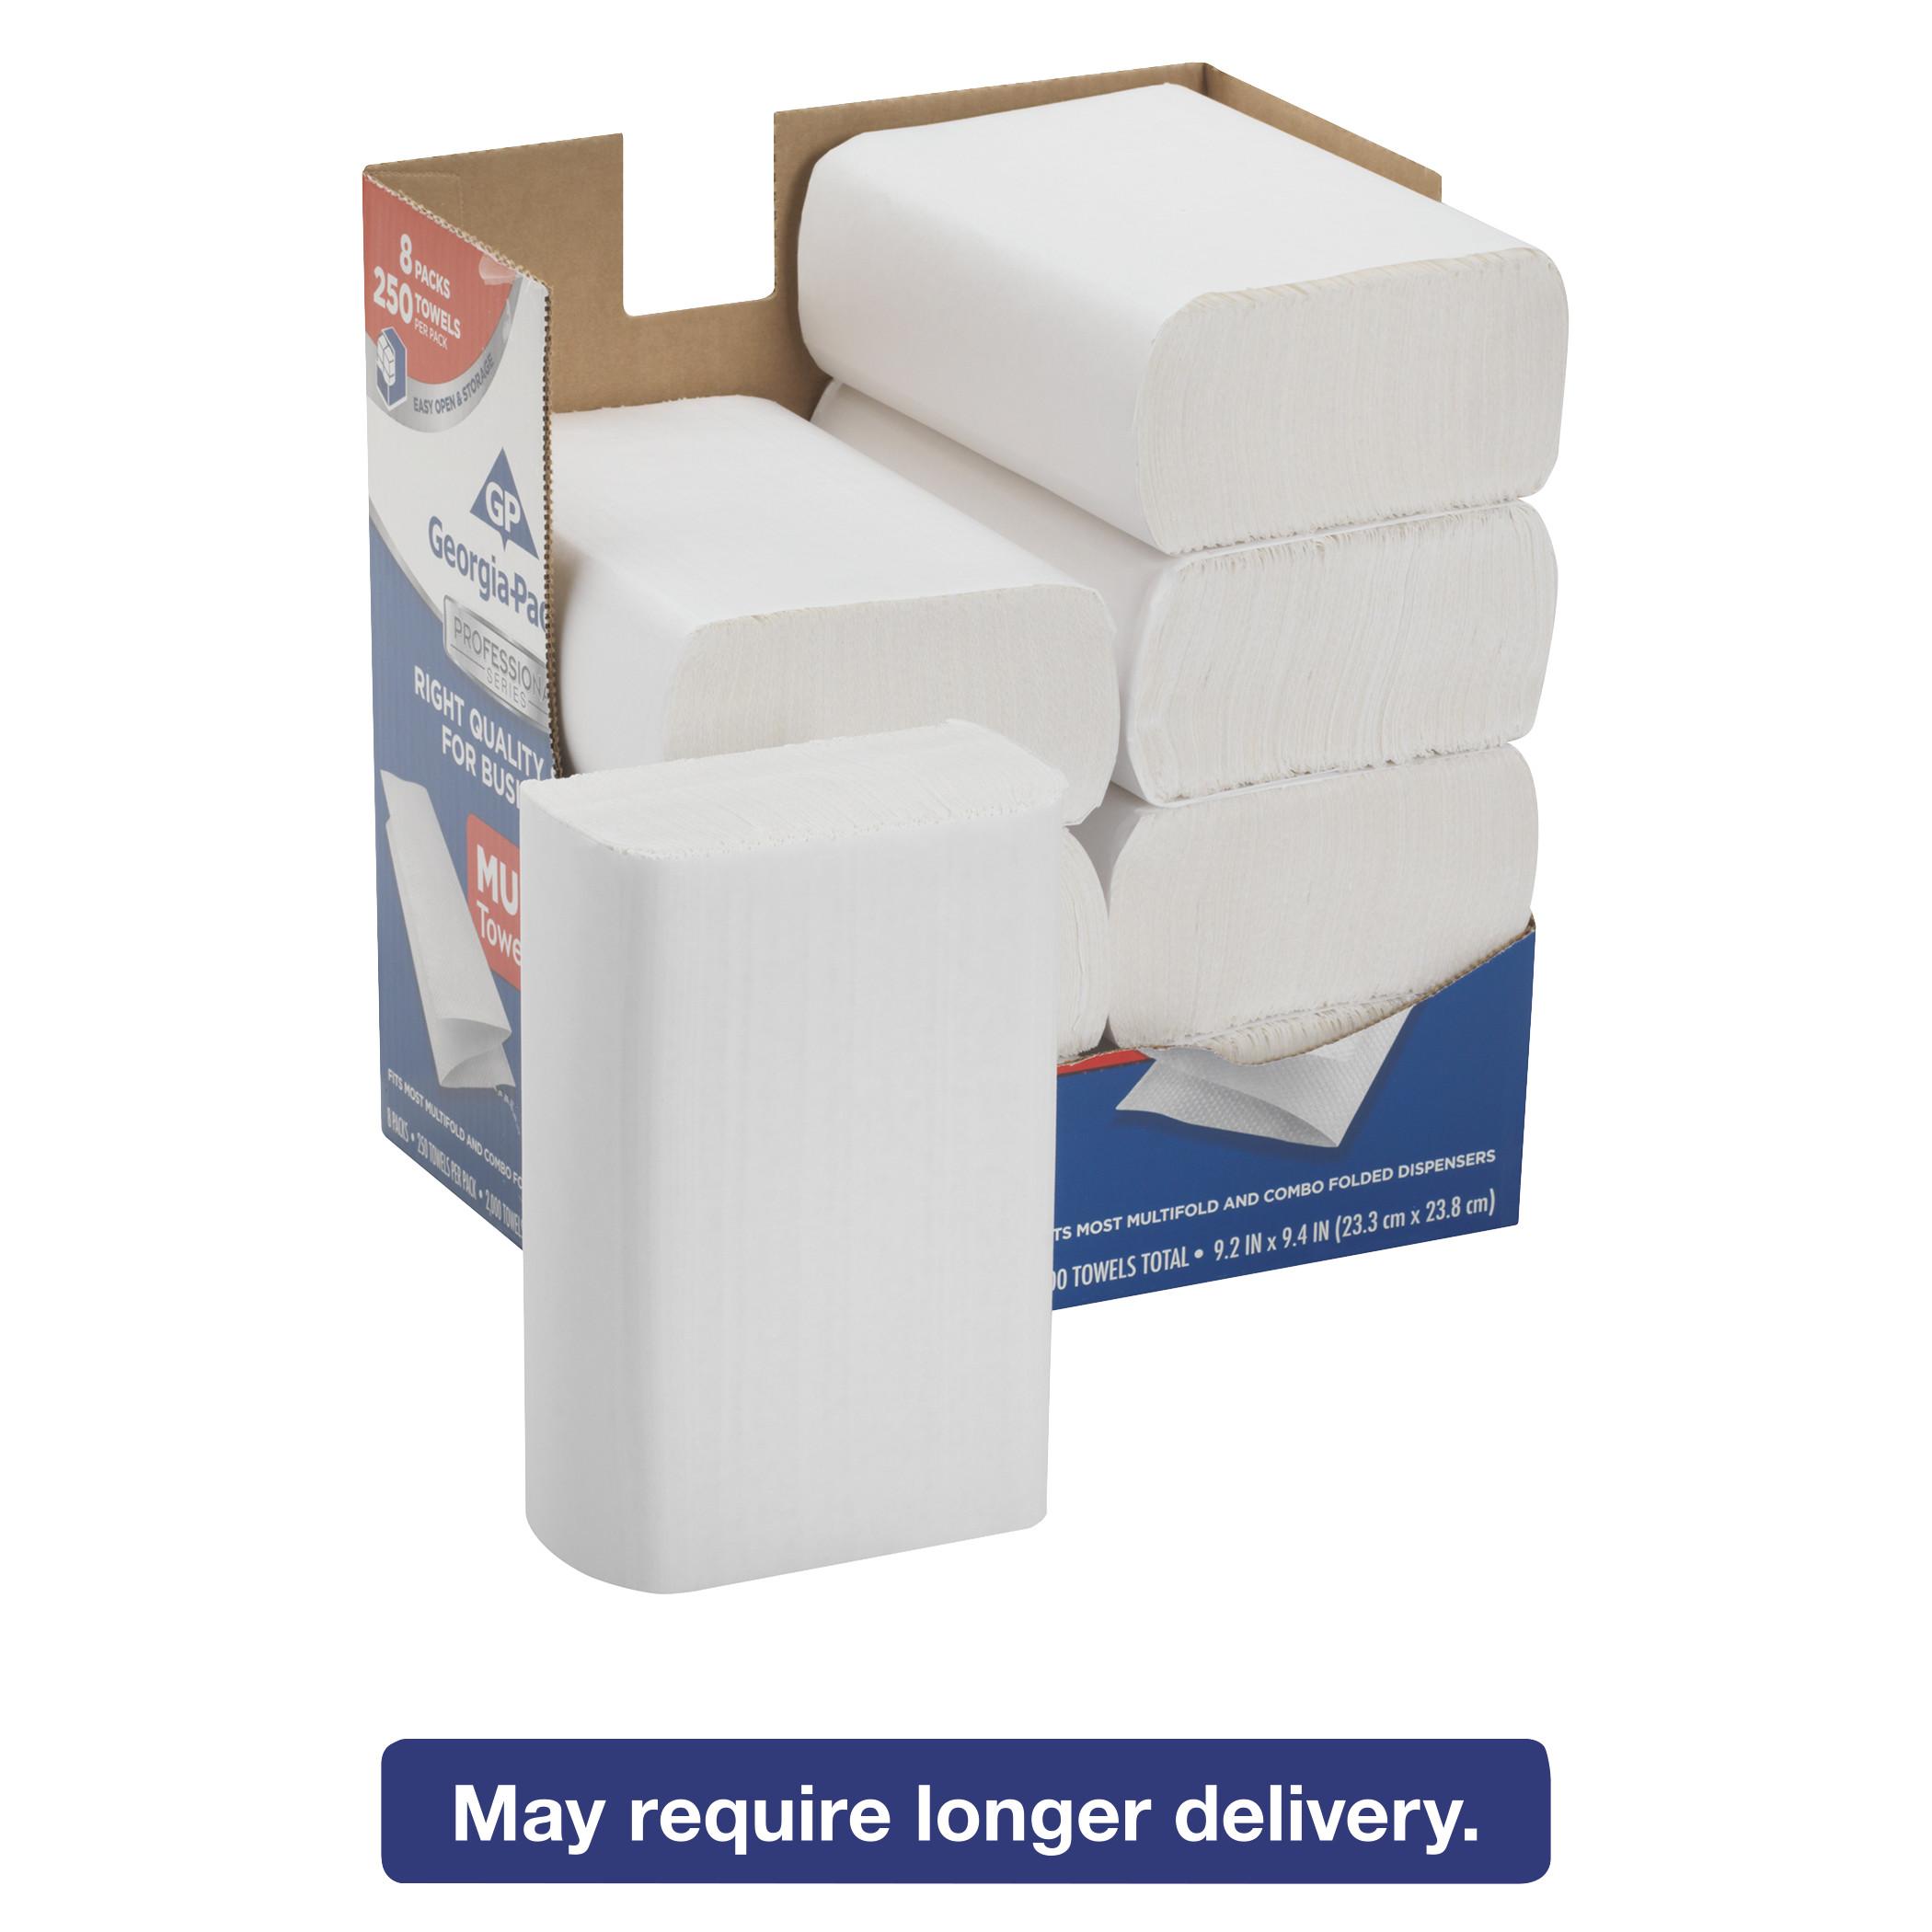 Georgia Pacific Professional Series Premium Paper Towels,M-Fold,9 2/5x9 1/5, 250/Bx, 8 Bx/Carton